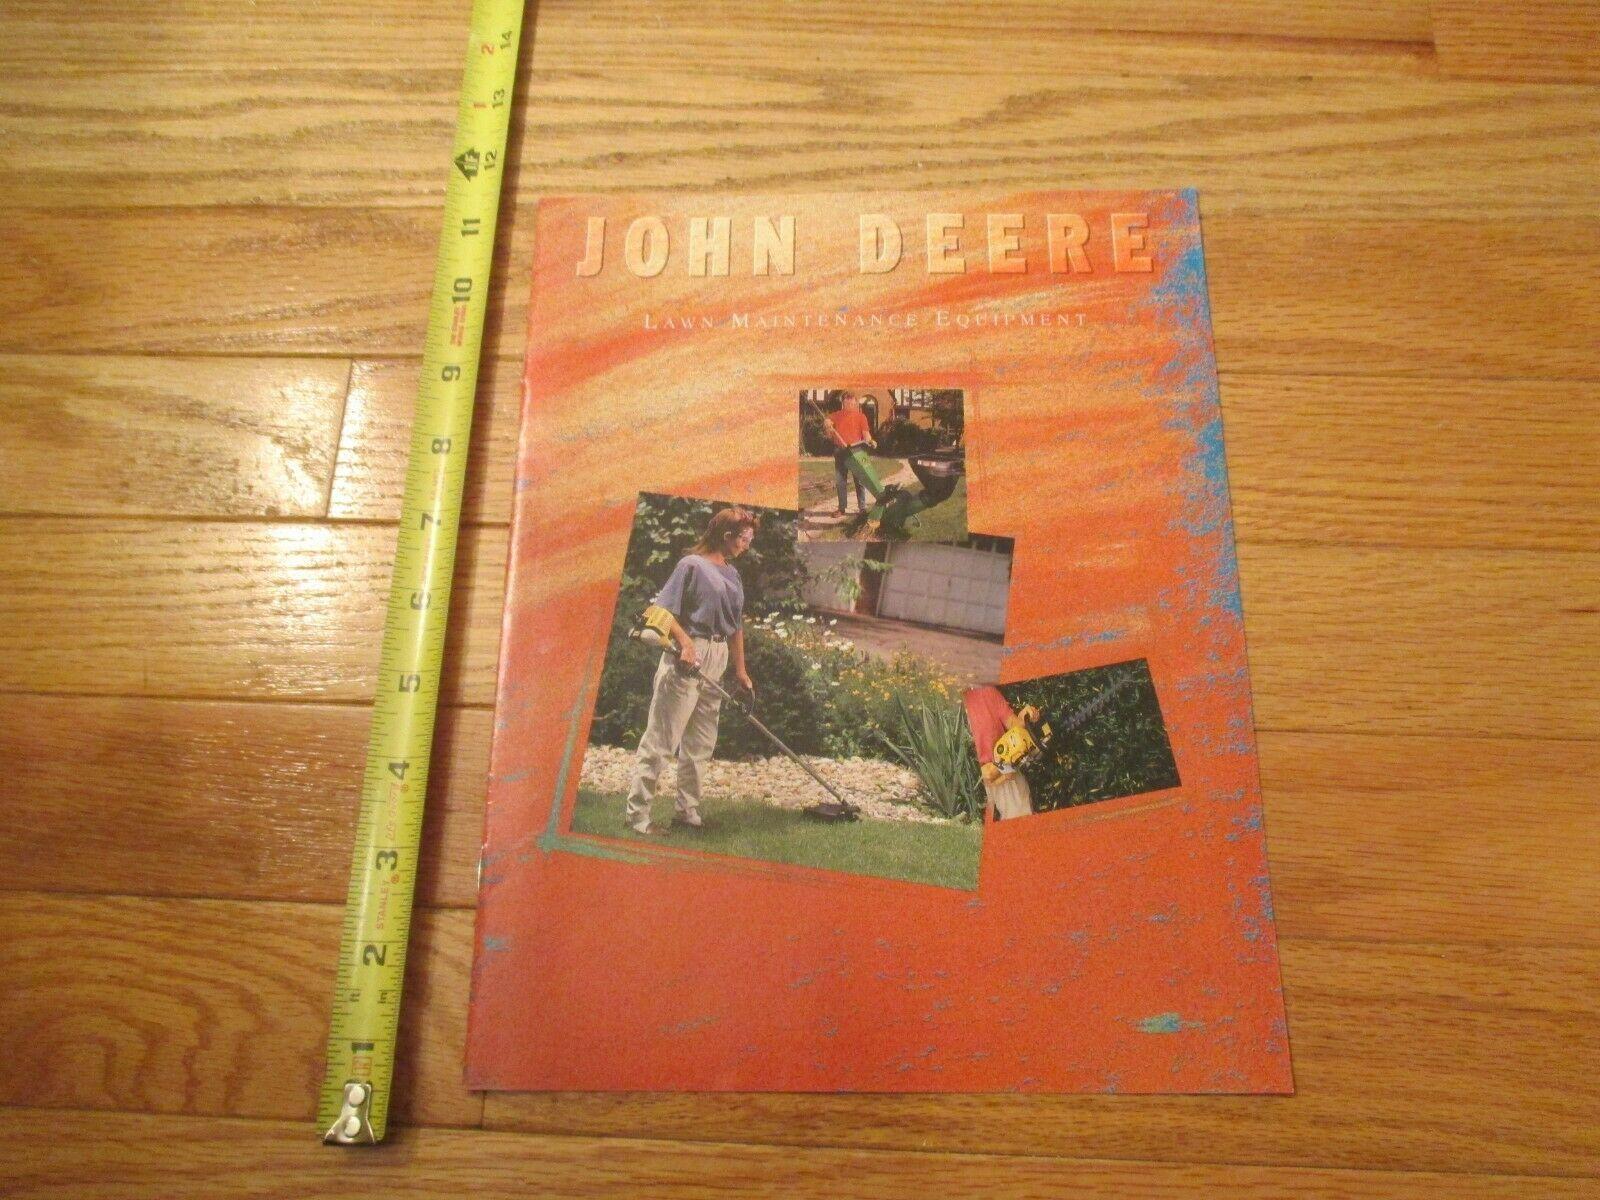 John Deere Lawn Maintenance Equipment Vintage Dealer sales brochure - $14.99